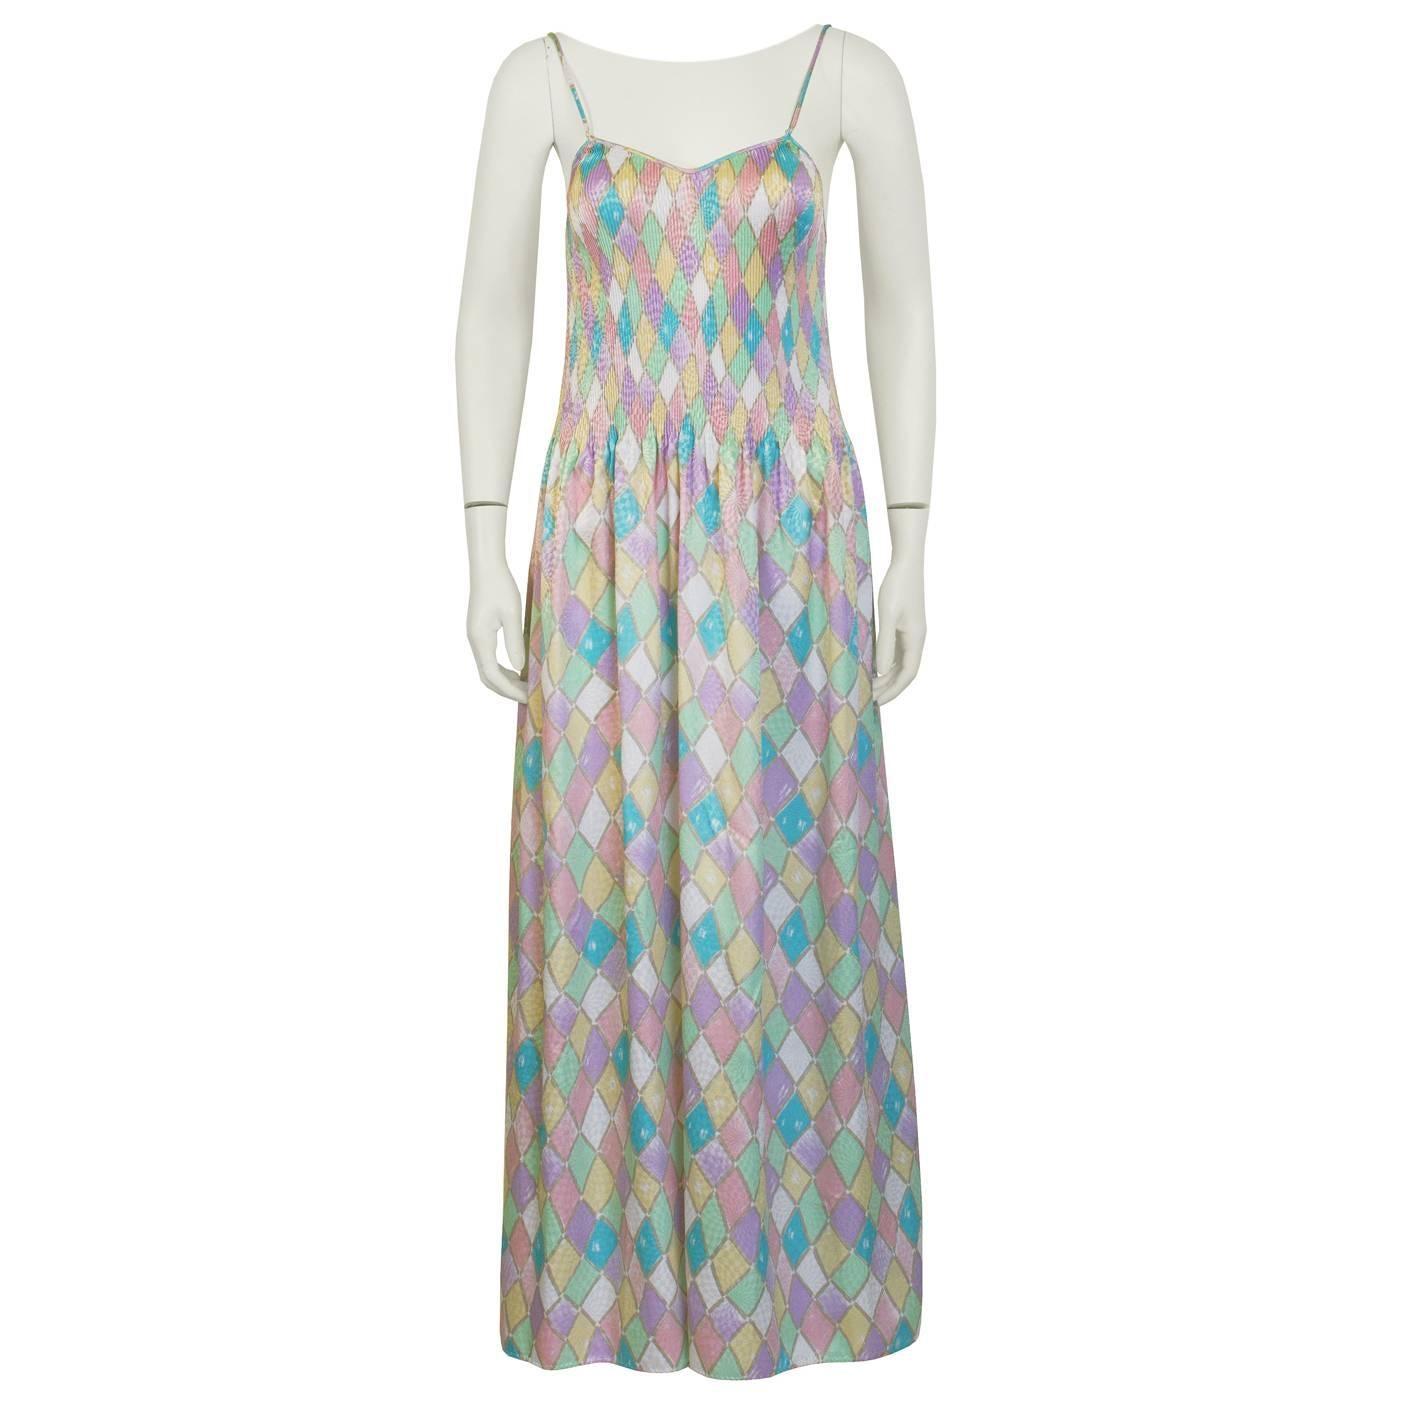 1980's Mary McFadden Pastel Pleated Dress